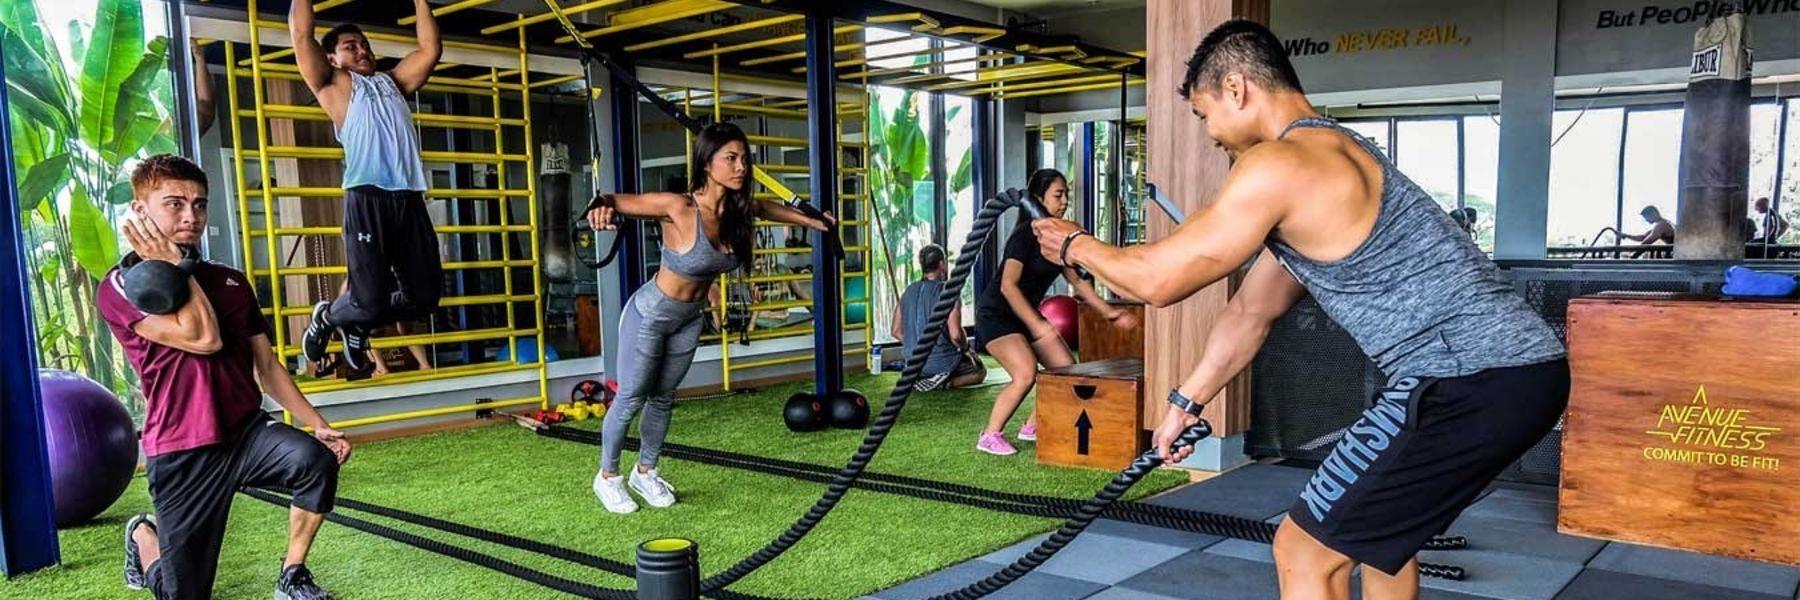 Avenue Fitness image